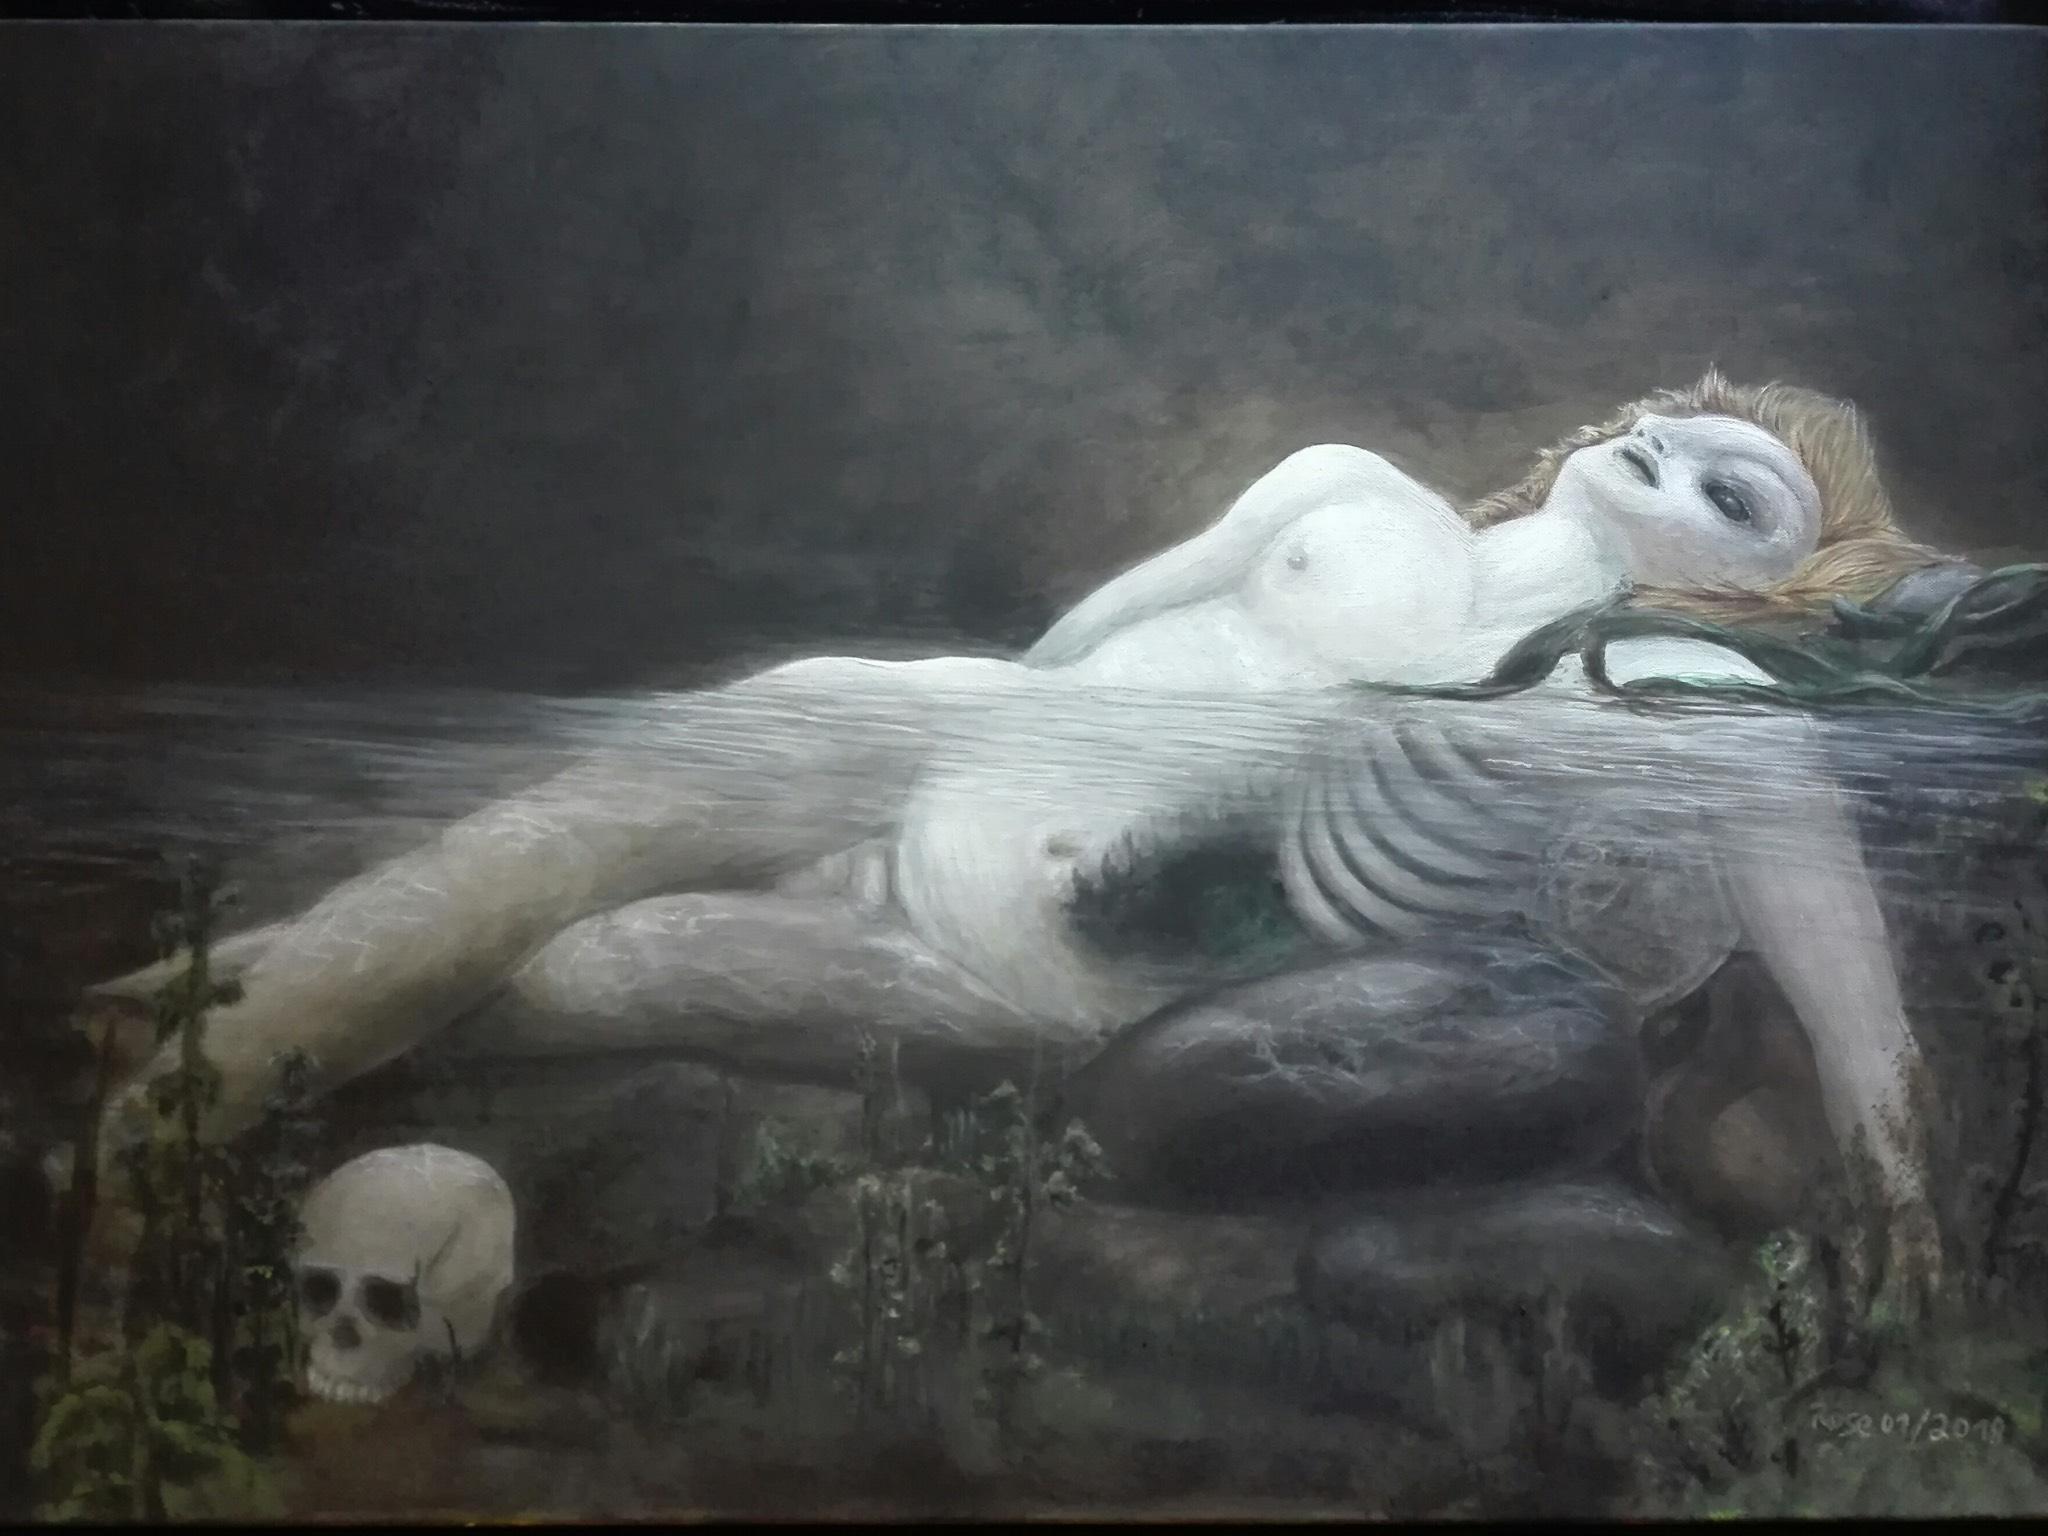 """Karolina"" von Rose Black, 70 × 100 cm, Leinwand, Acryl. Foto: Delila Berger"